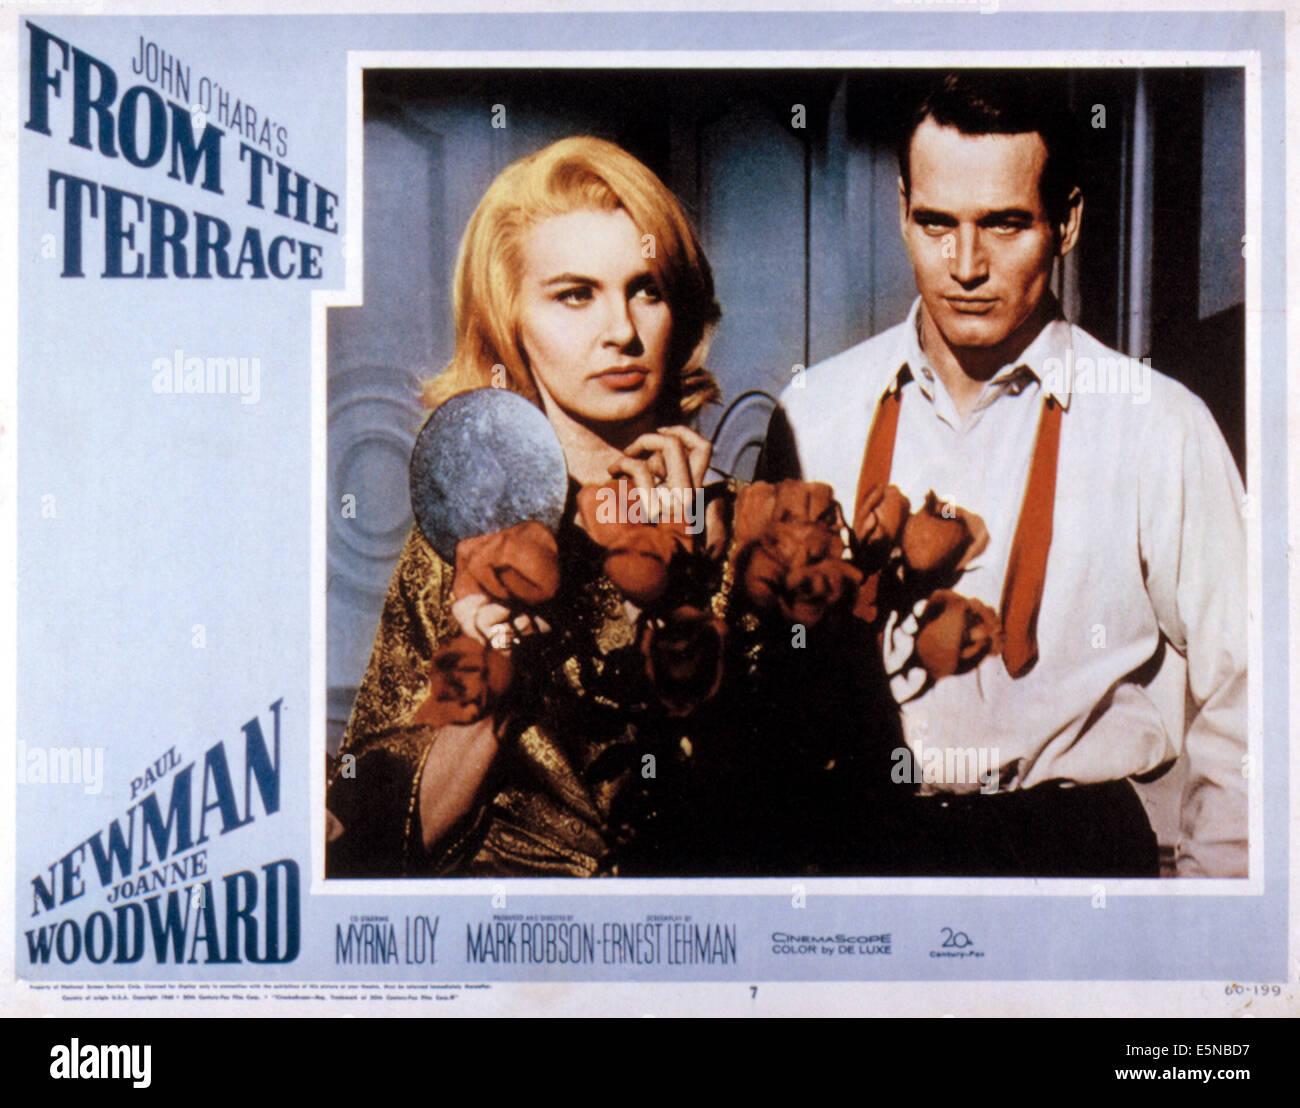 Dalla terrazza, Joanne Woodward, Paul Newman, 1960. TM e Copyright ...